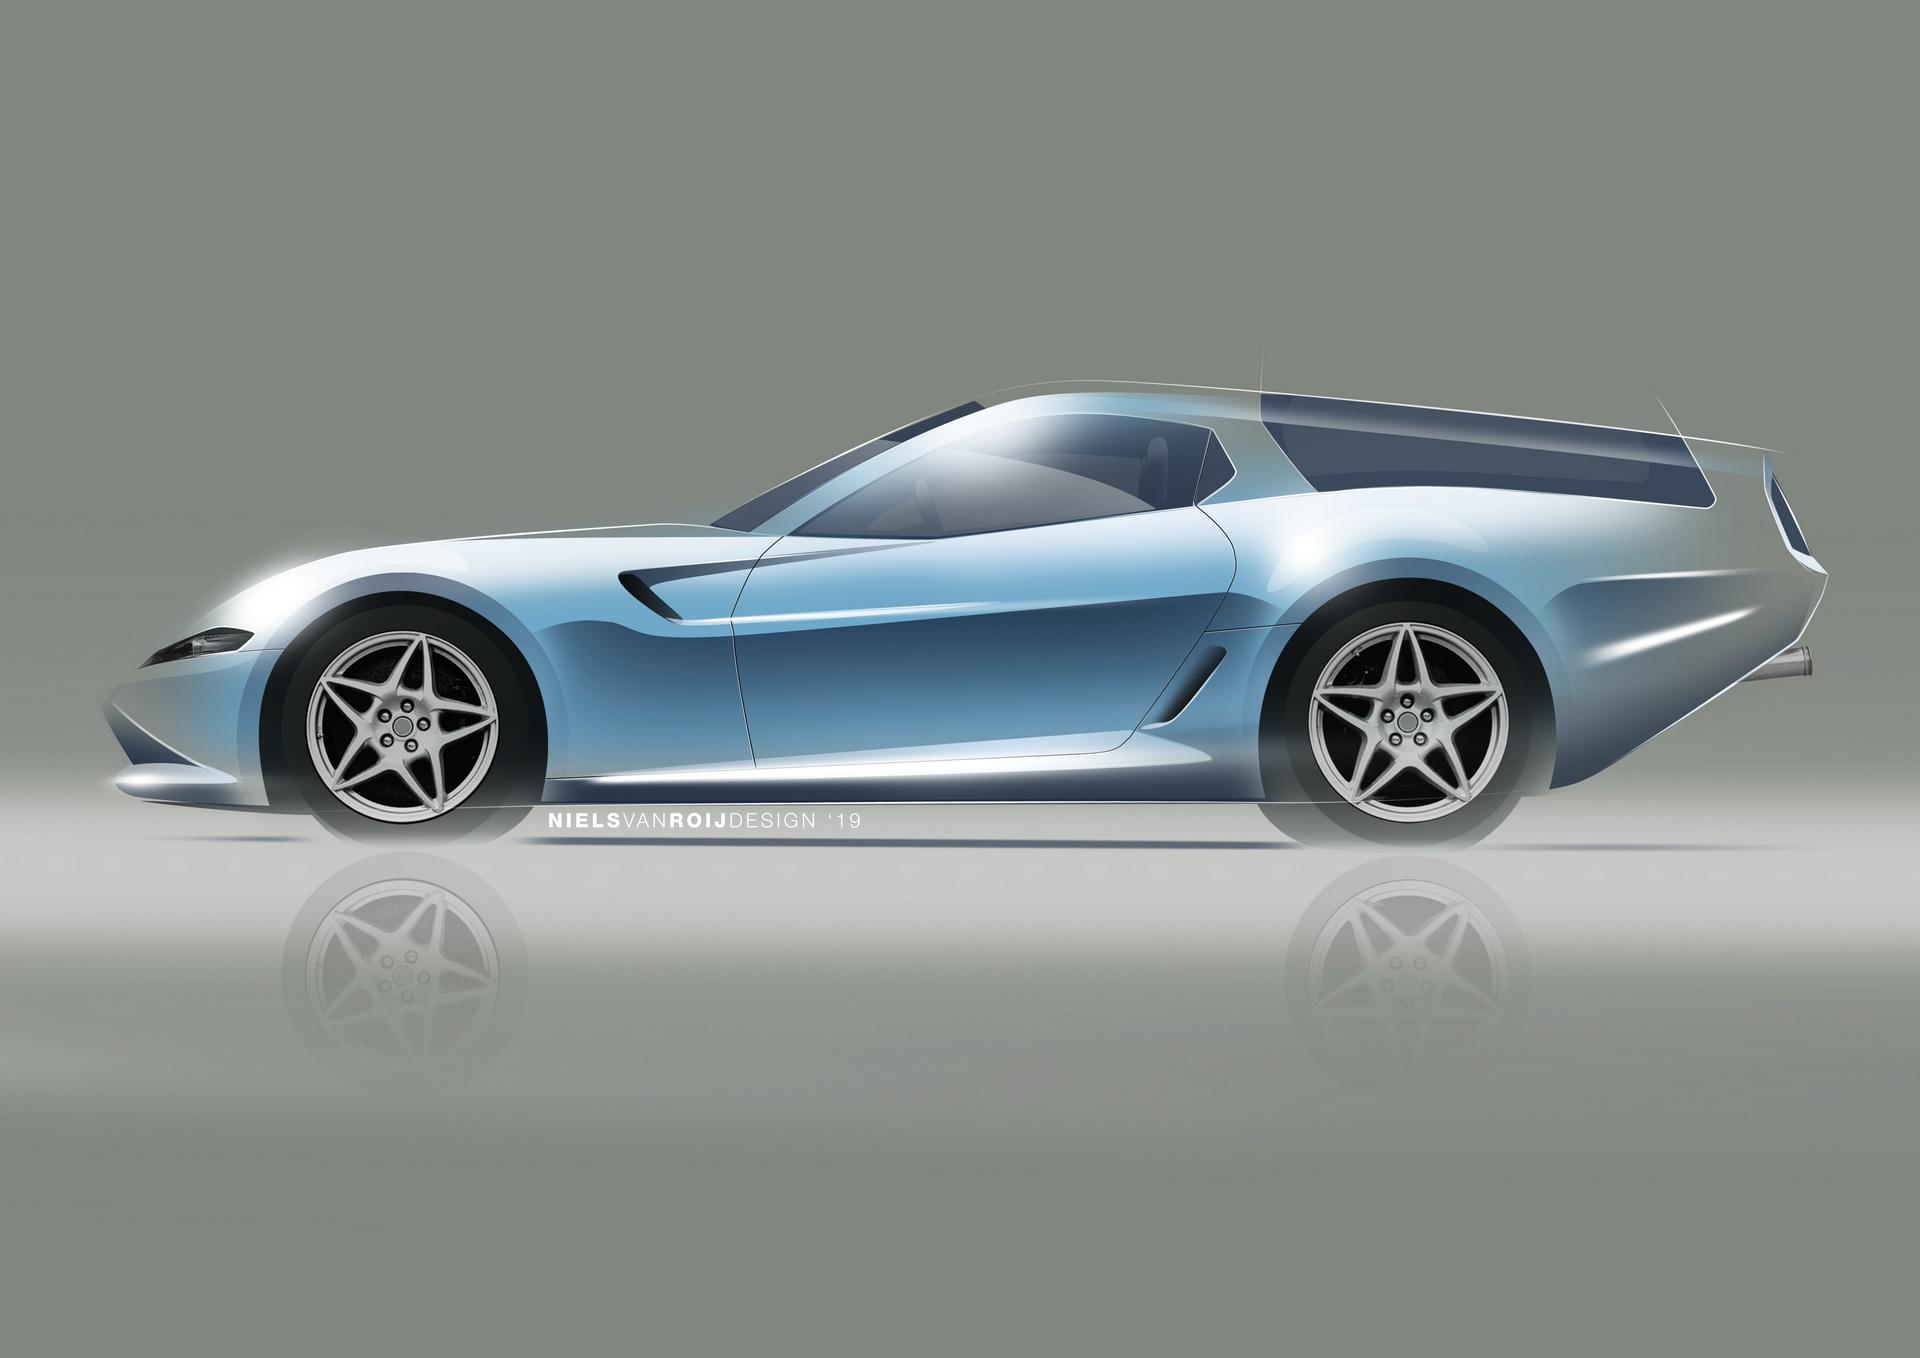 Ferrari-Daytona-Shooting-Brake-Hommage-by-Niels-van-Roij-Design-14